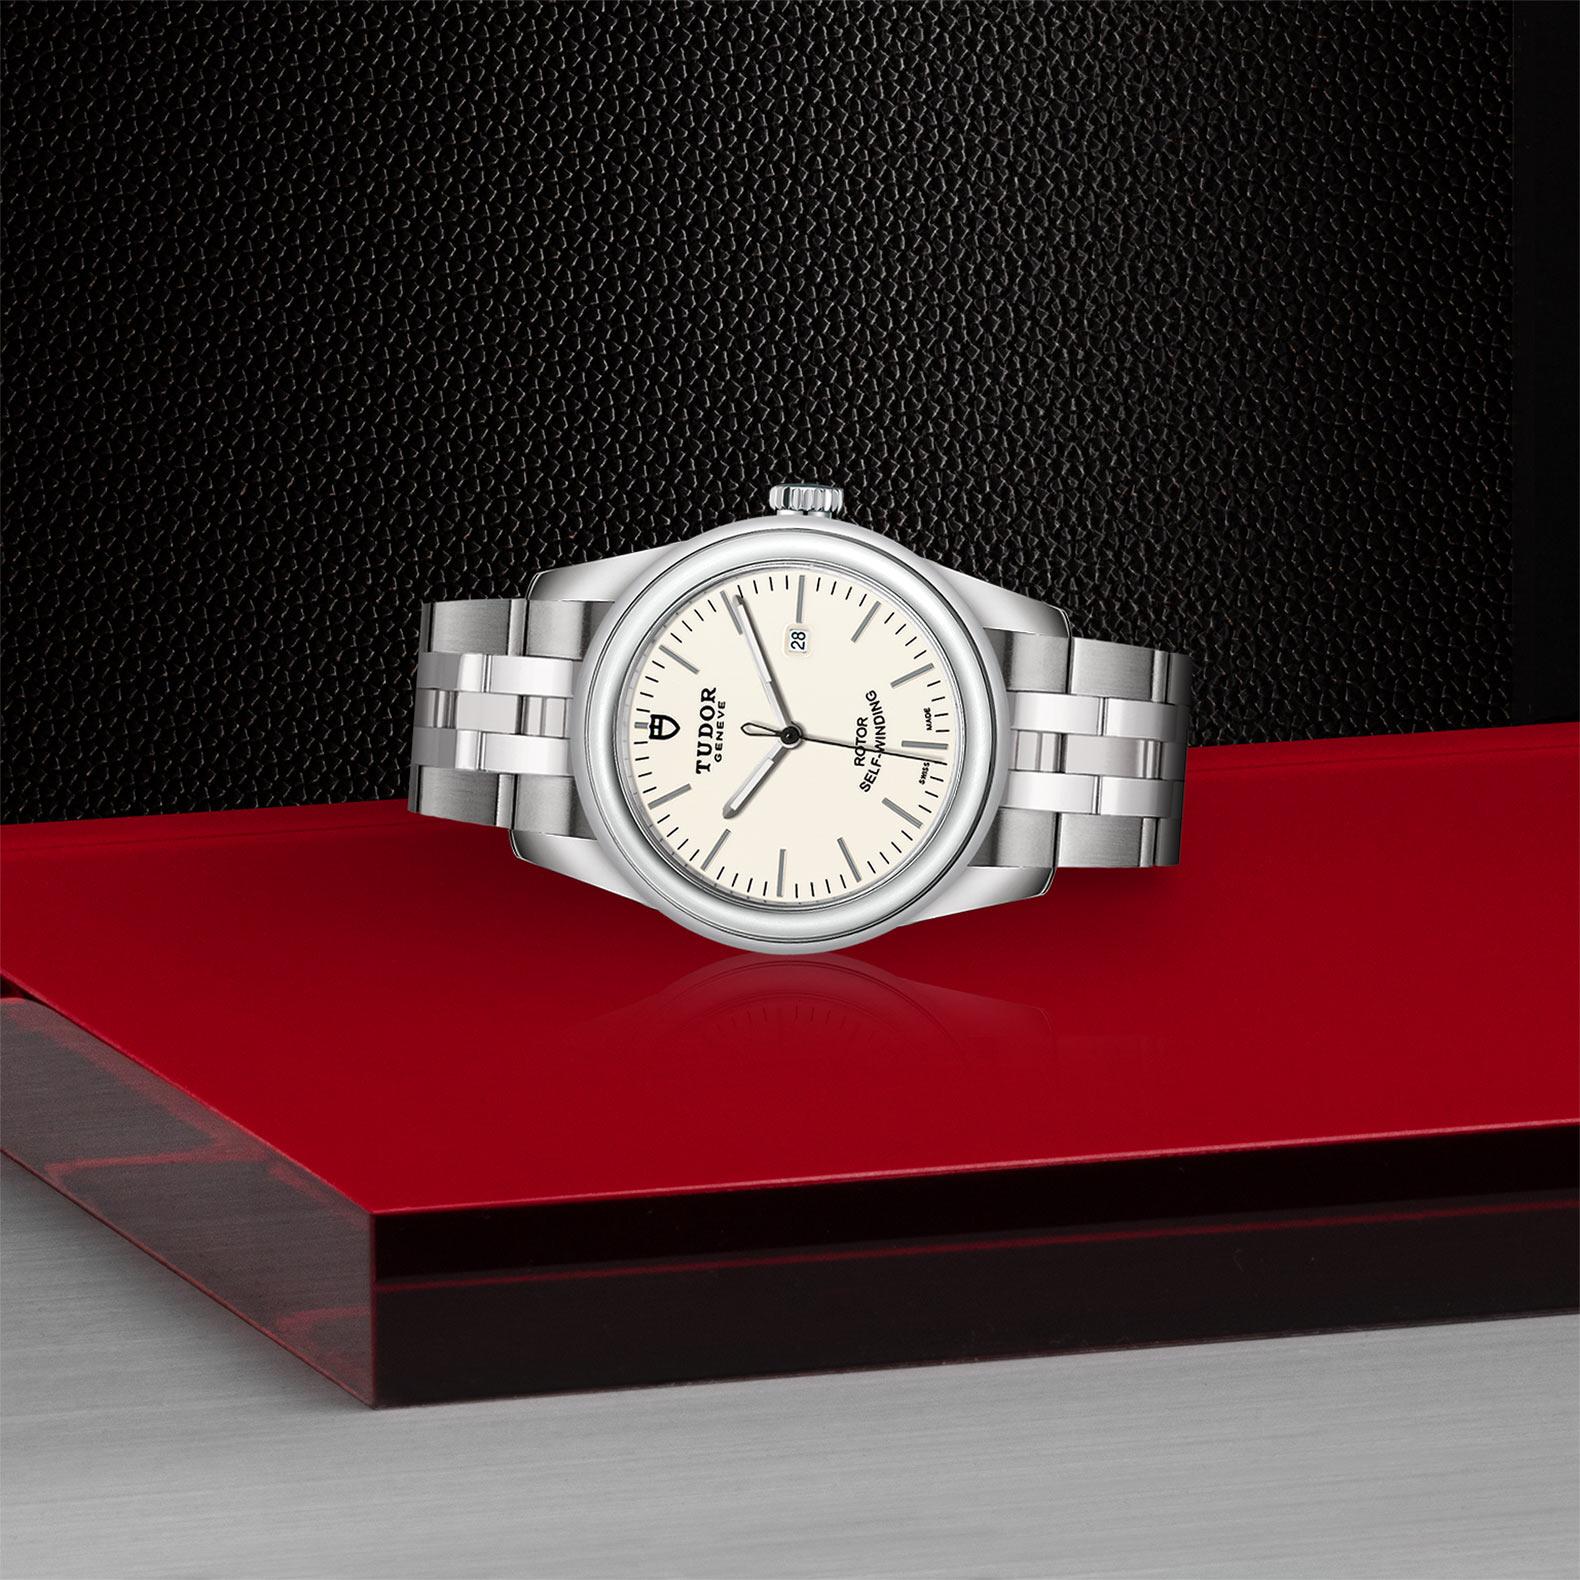 TUDOR Glamour Date - M53000-0079